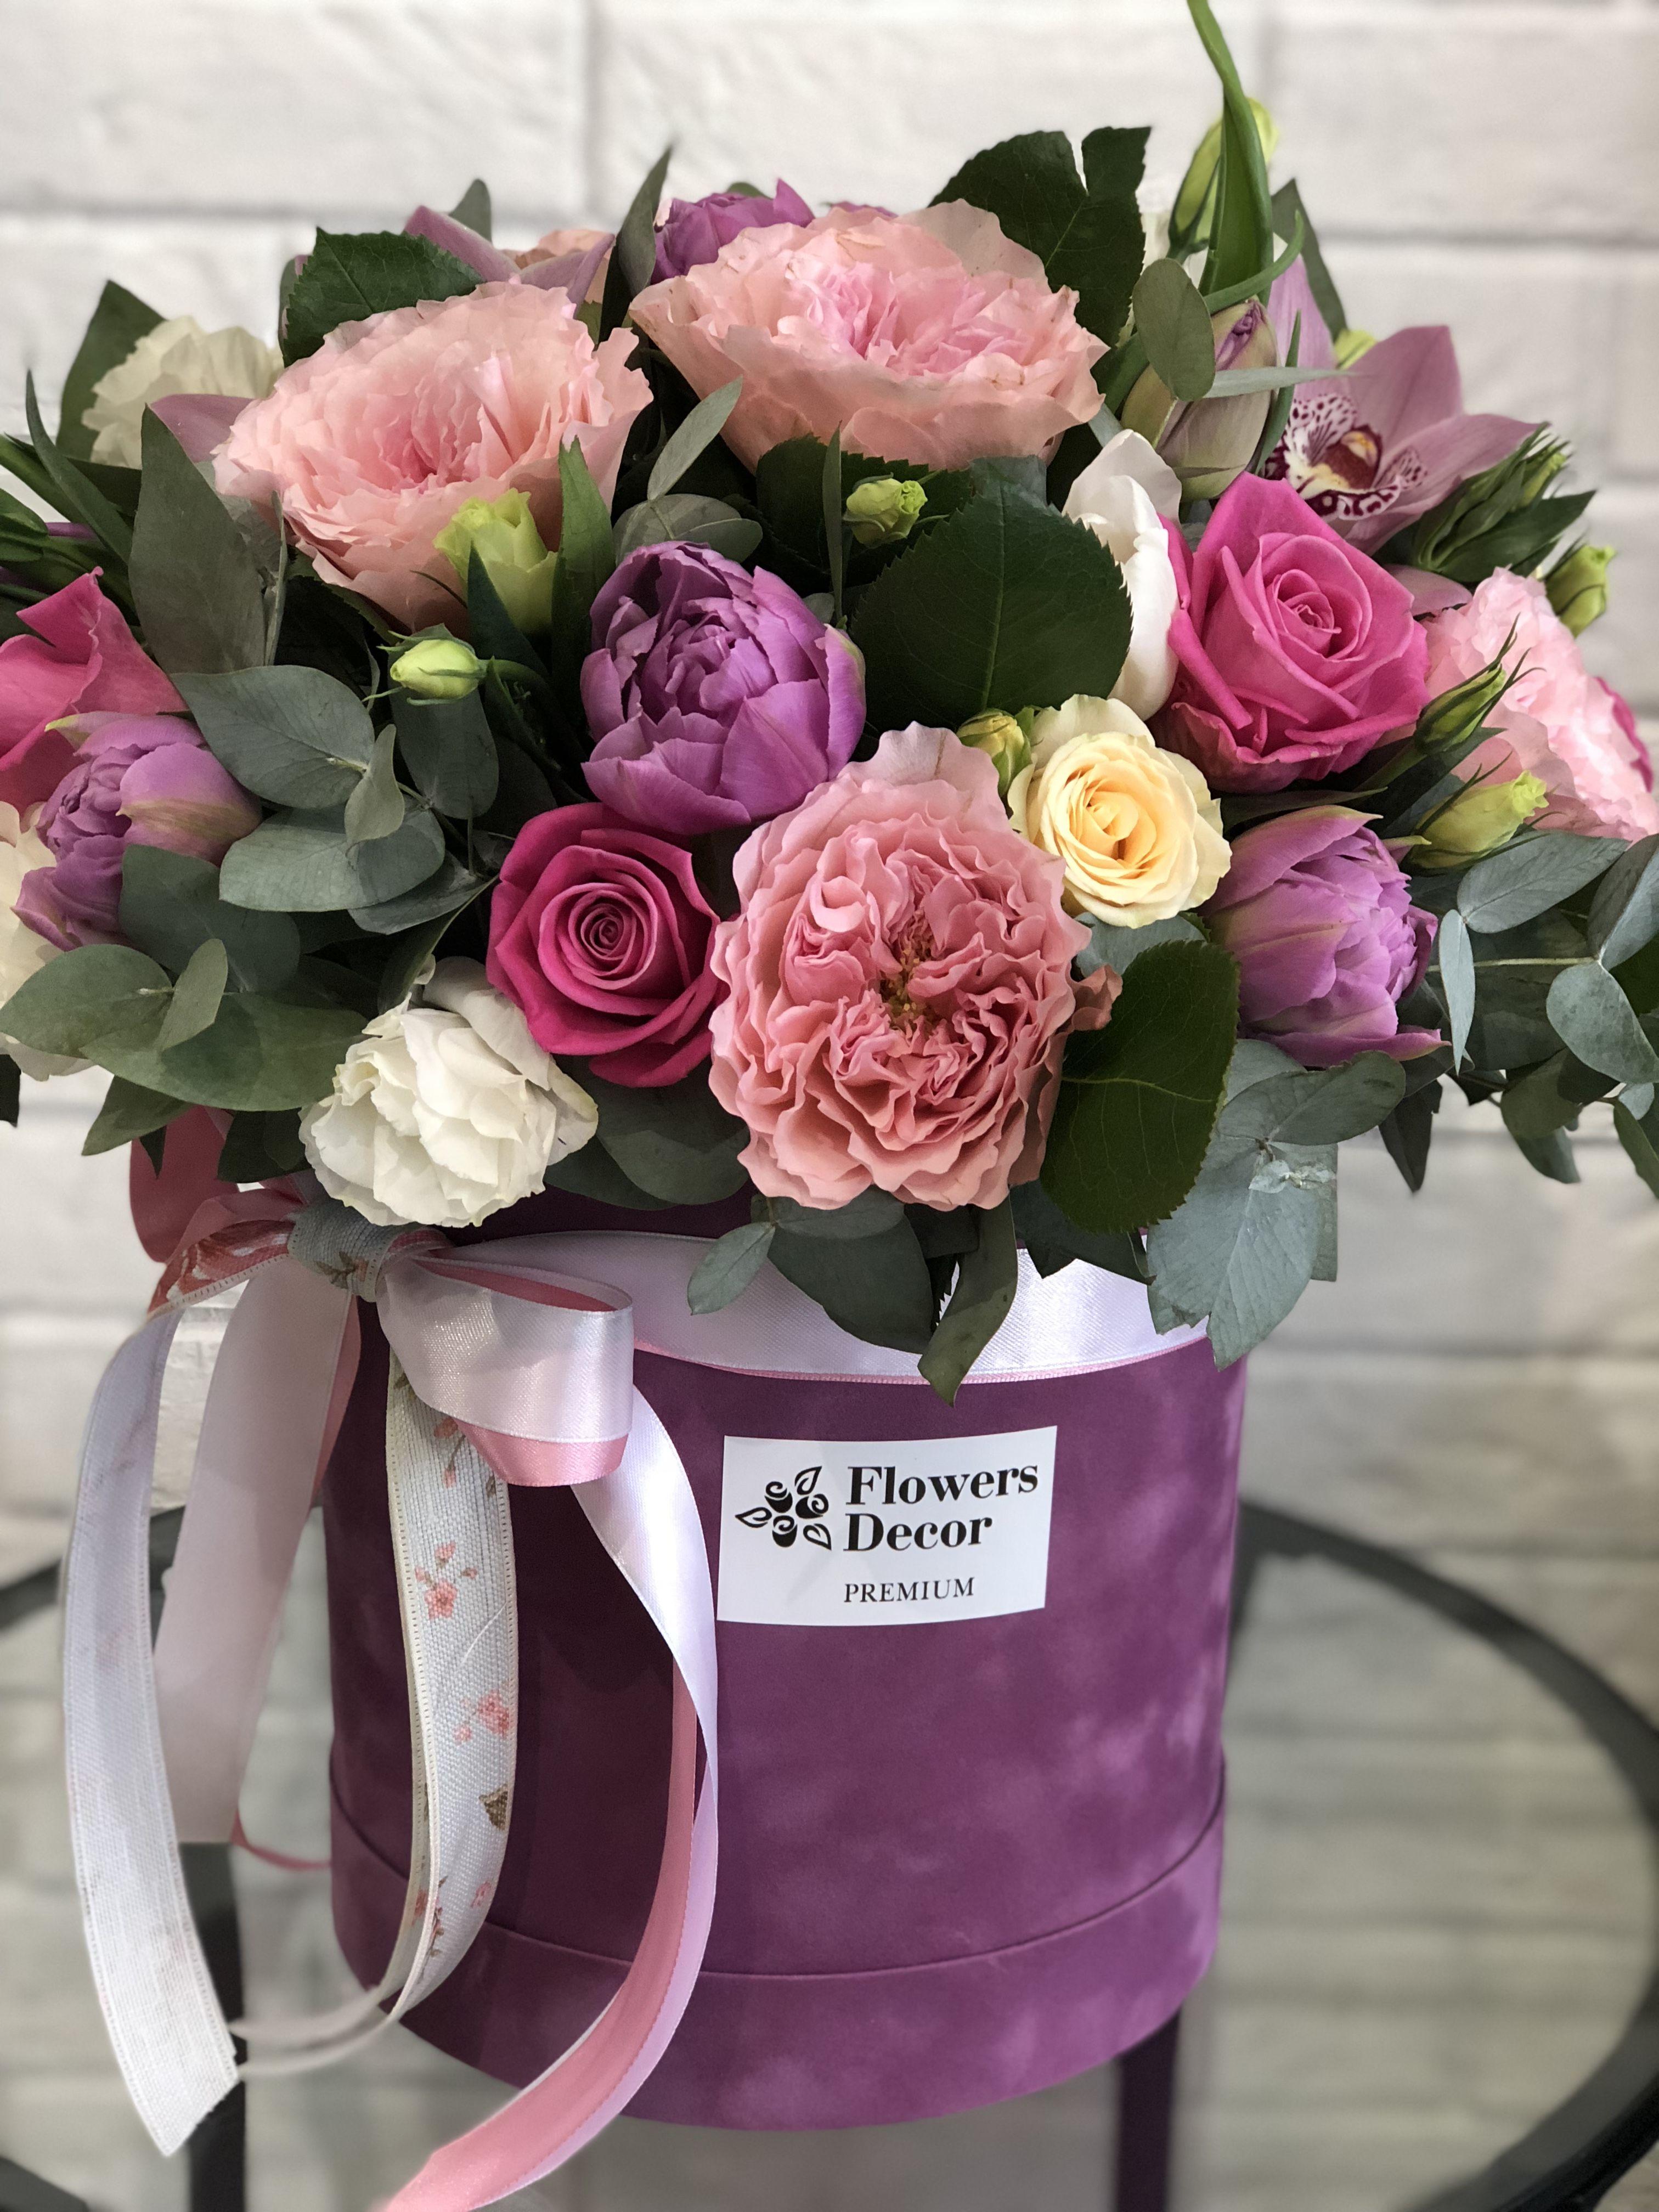 Pin By Cvety Novorossijsk Flowersdec On Kompozicii V Shlyapnoj Korobke Novorossijsk Birthday Flowers Bouquet Luxury Flower Arrangement Flower Bouquet Boxes